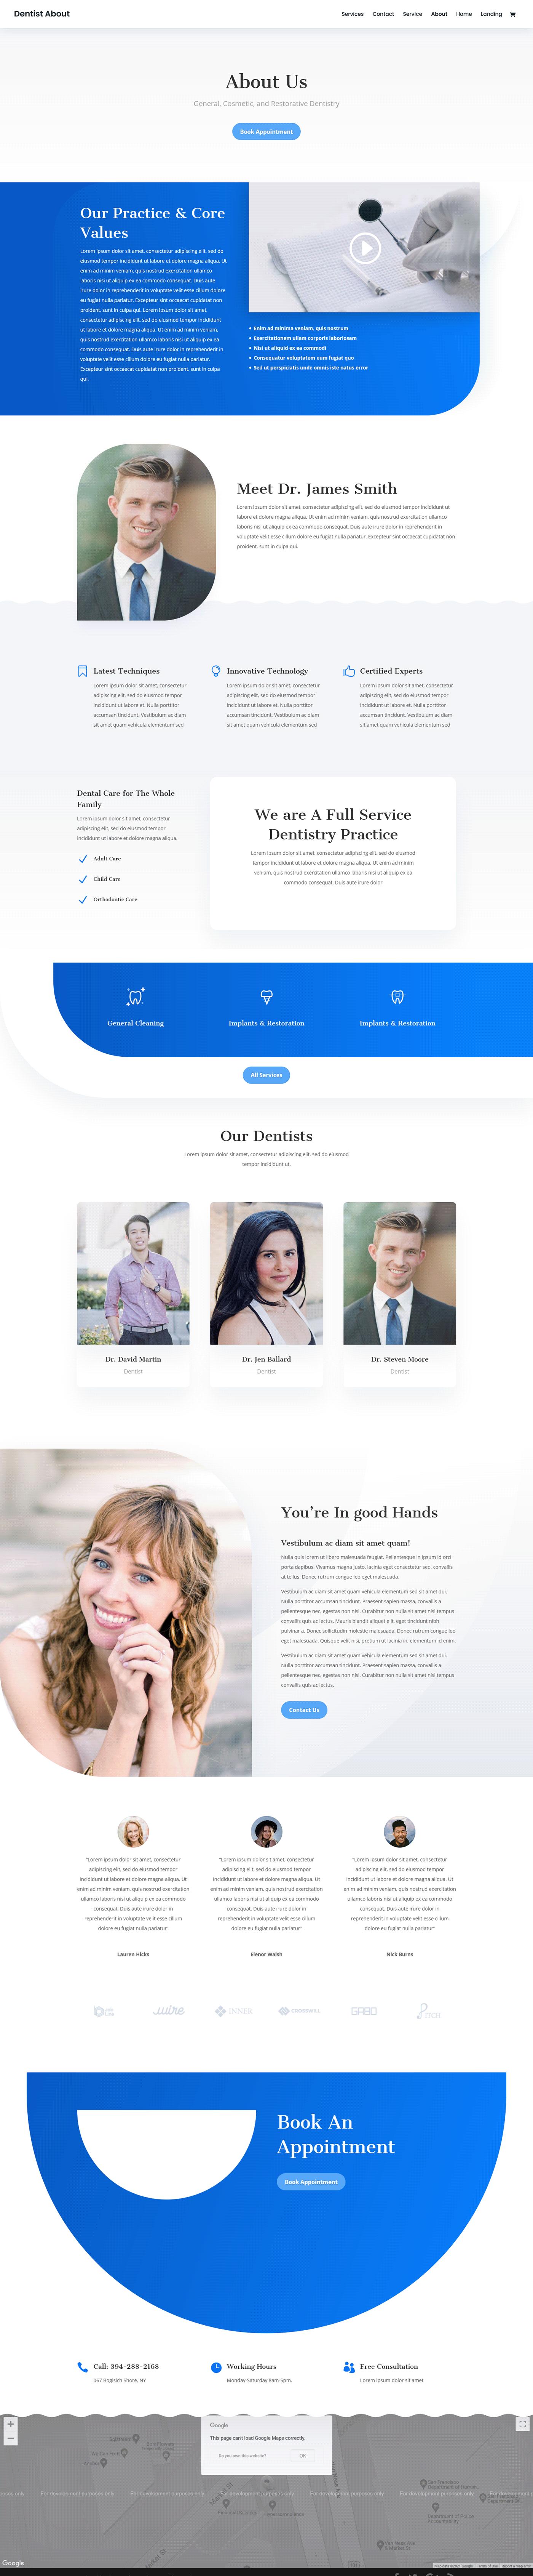 Business Website corporate website dentist website landing page design modern website modern website design Professional website web development  Website Design zaman ador